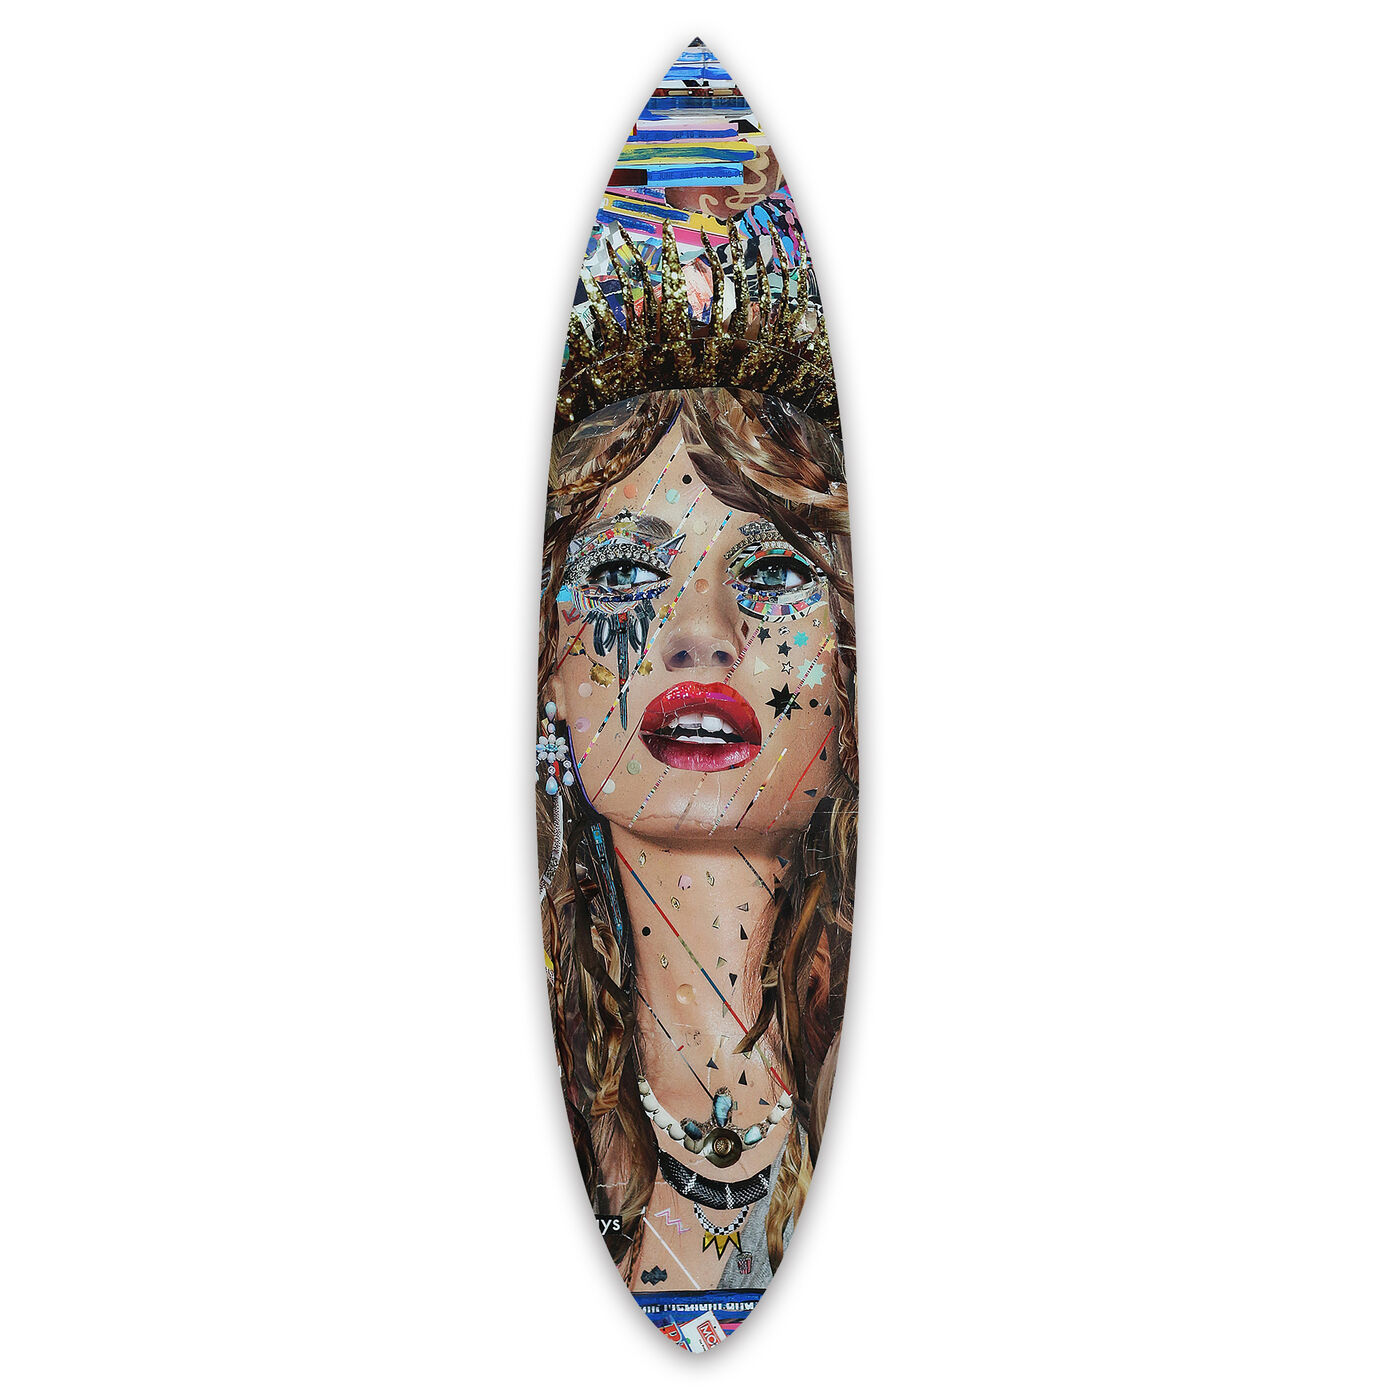 Katy Hirschfeld - Heroes Surfboard